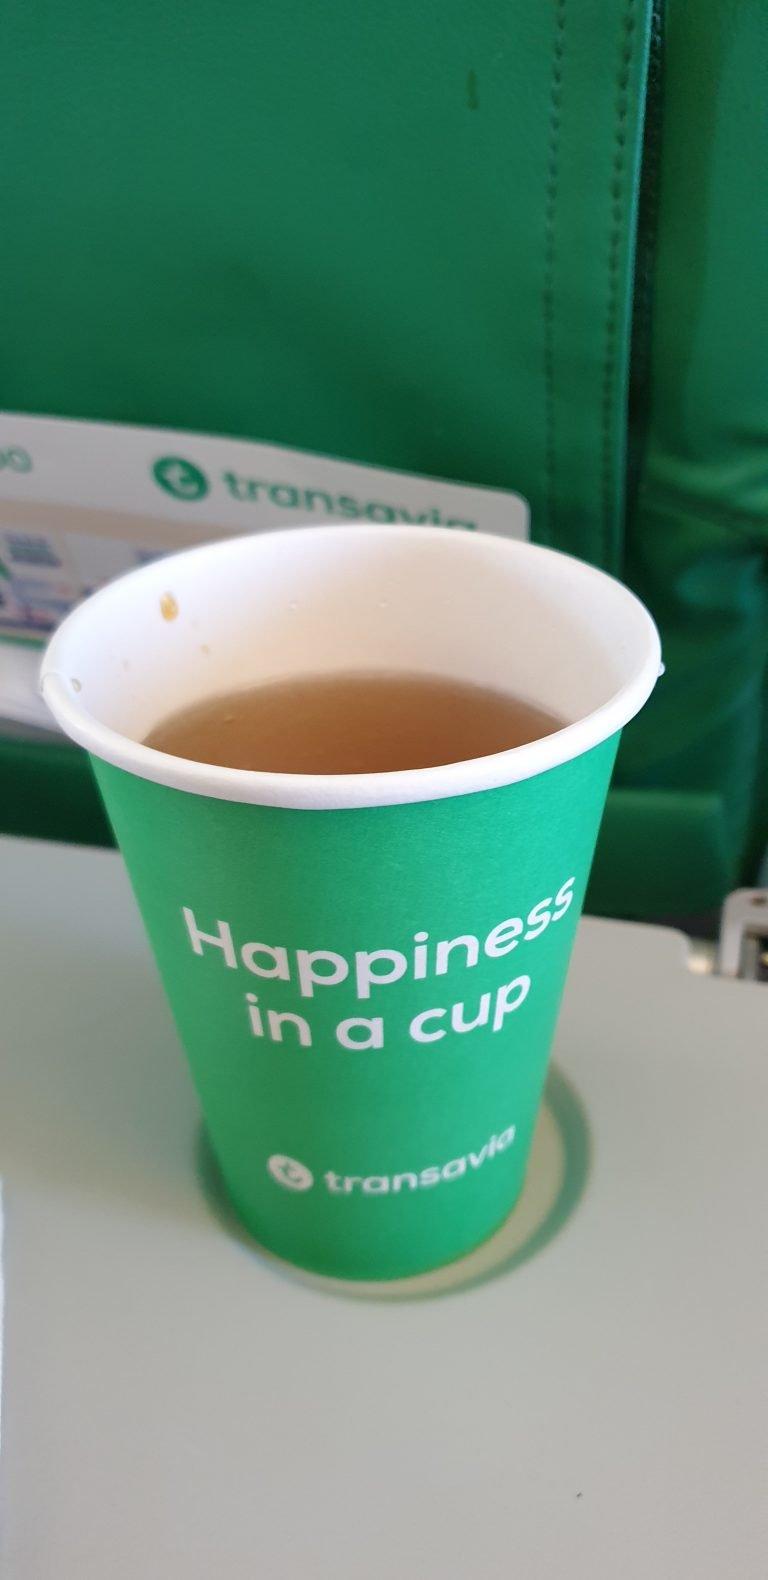 Happiness in a cup, aan boord van Transavia